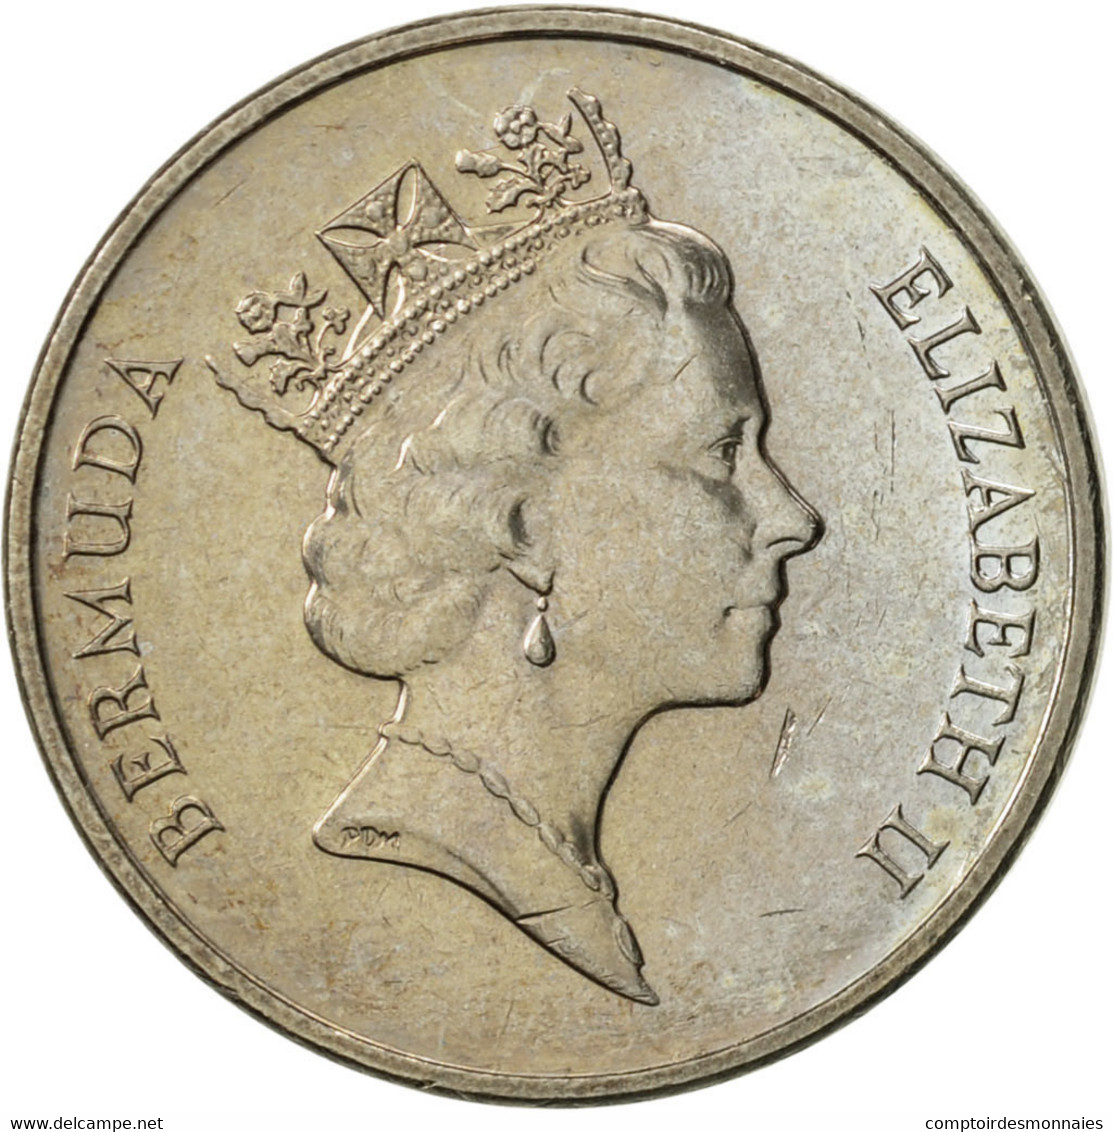 Bermuda, Elizabeth II, 5 Cents, 1997, SUP, Copper-nickel, KM:45 - Bermudes